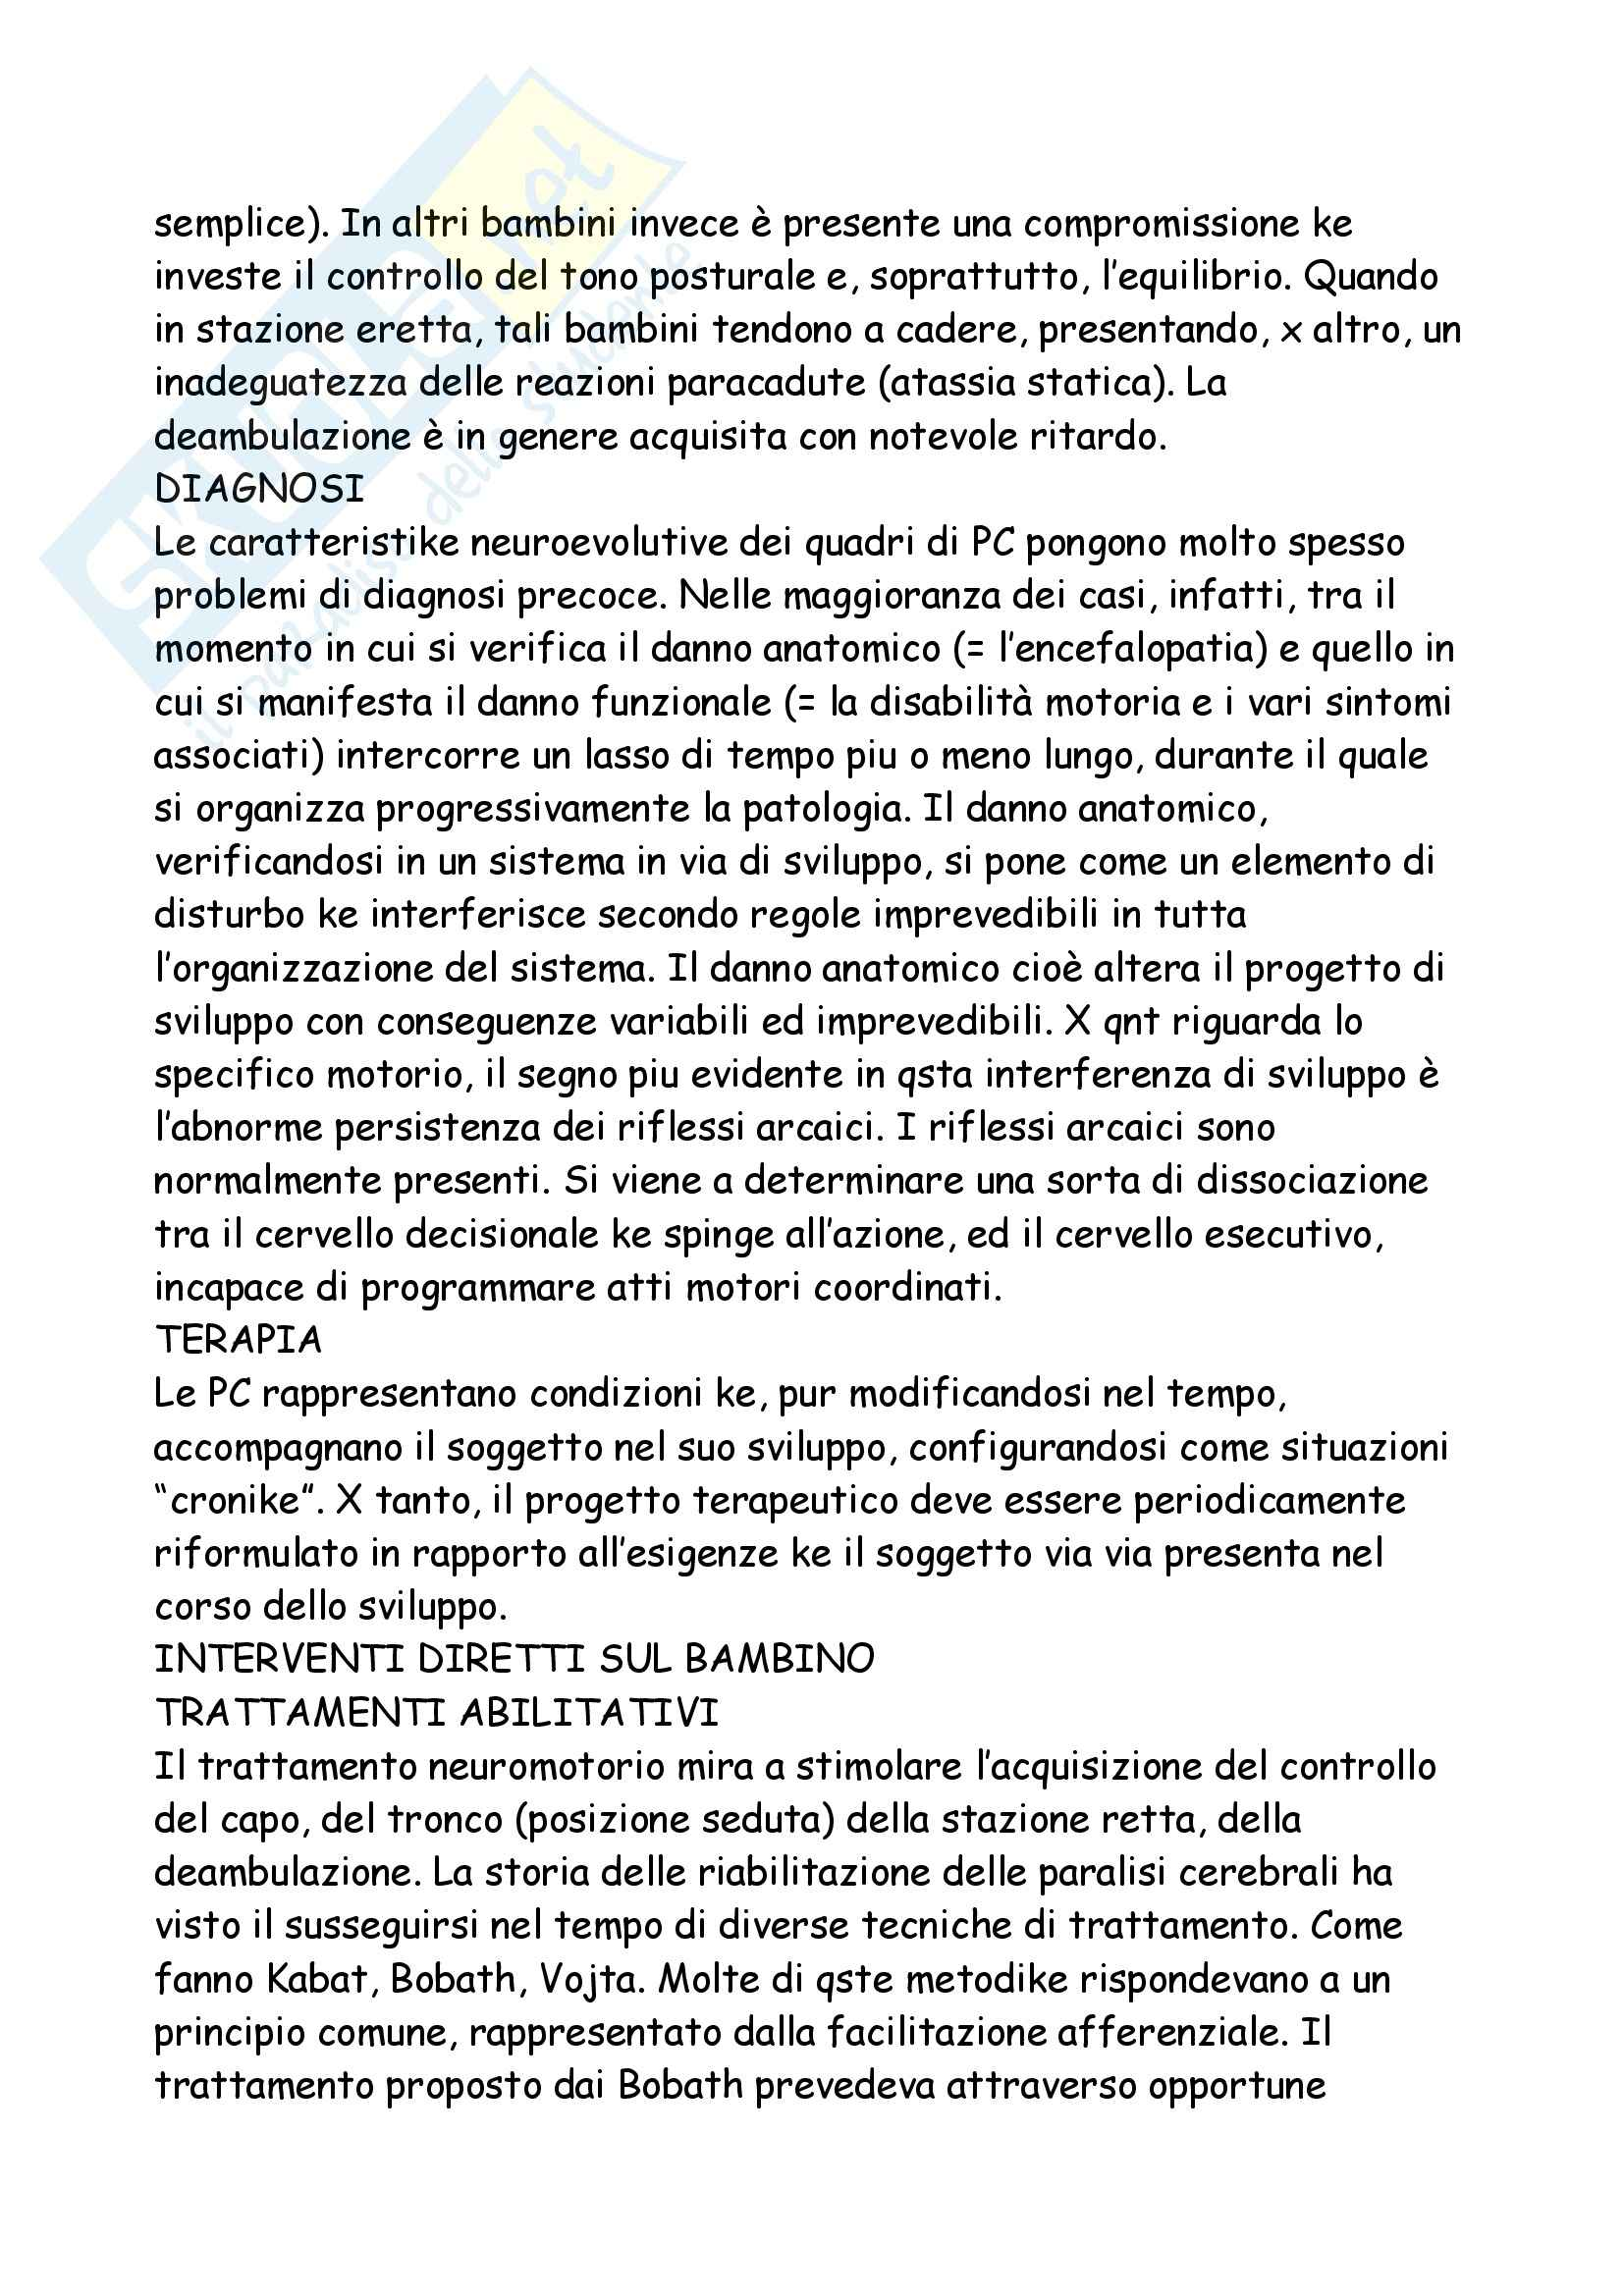 Neuropsichiatria Infantile Pag. 66